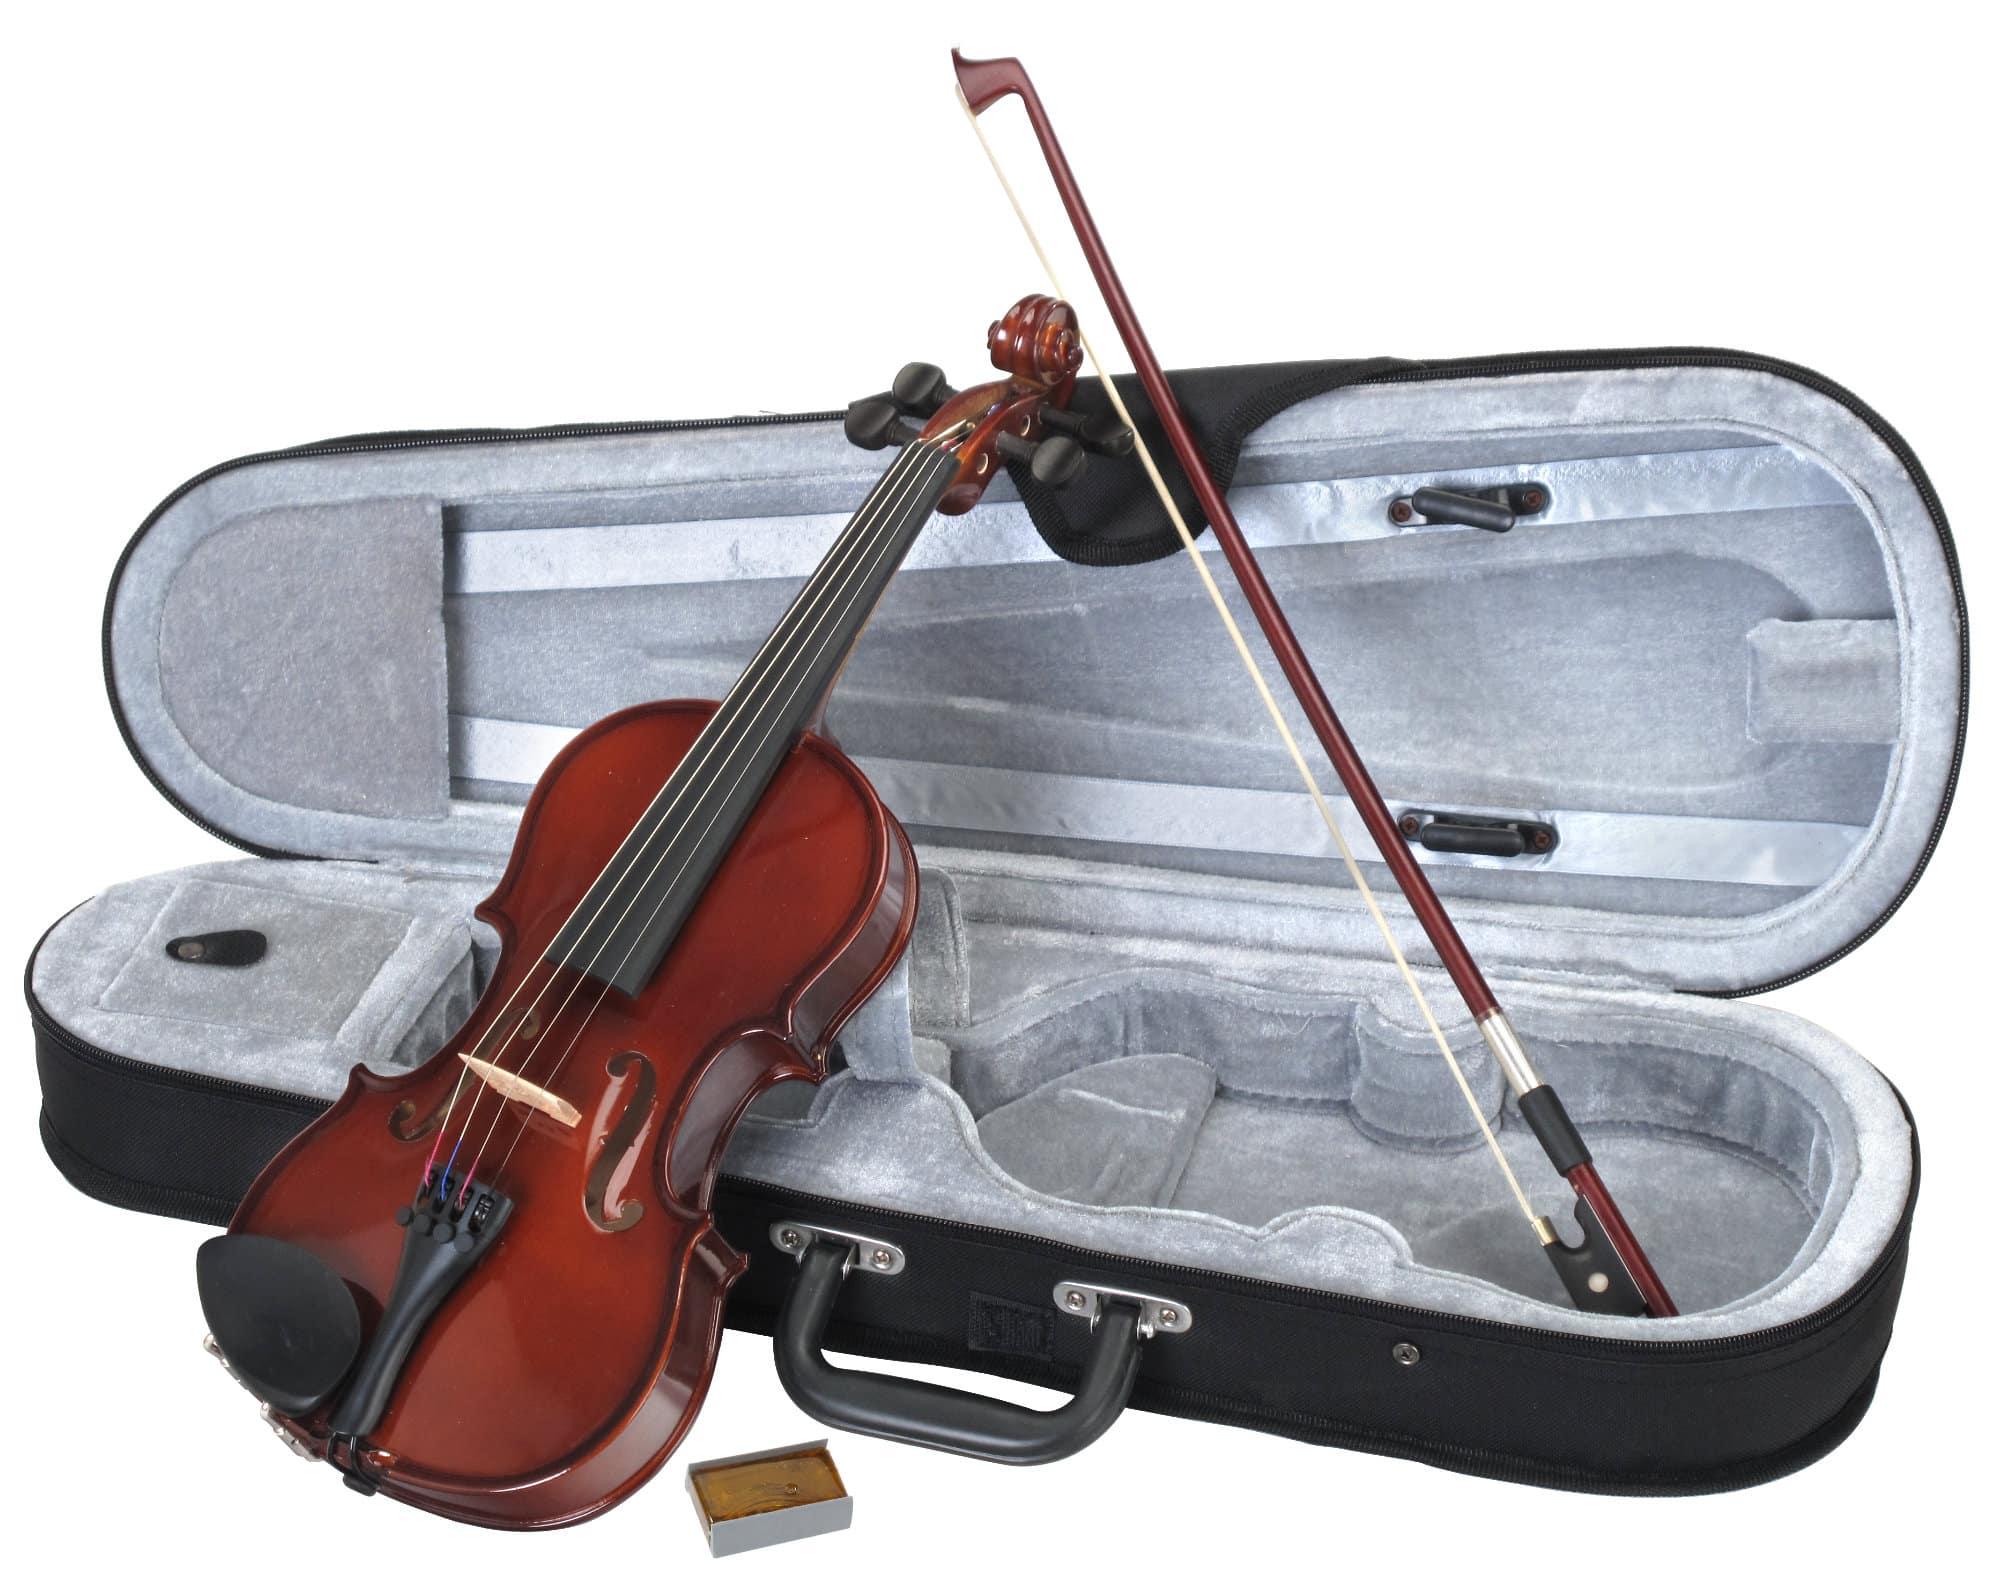 Violinen - Classic Cantabile Student Violinset 1|2 - Onlineshop Musikhaus Kirstein